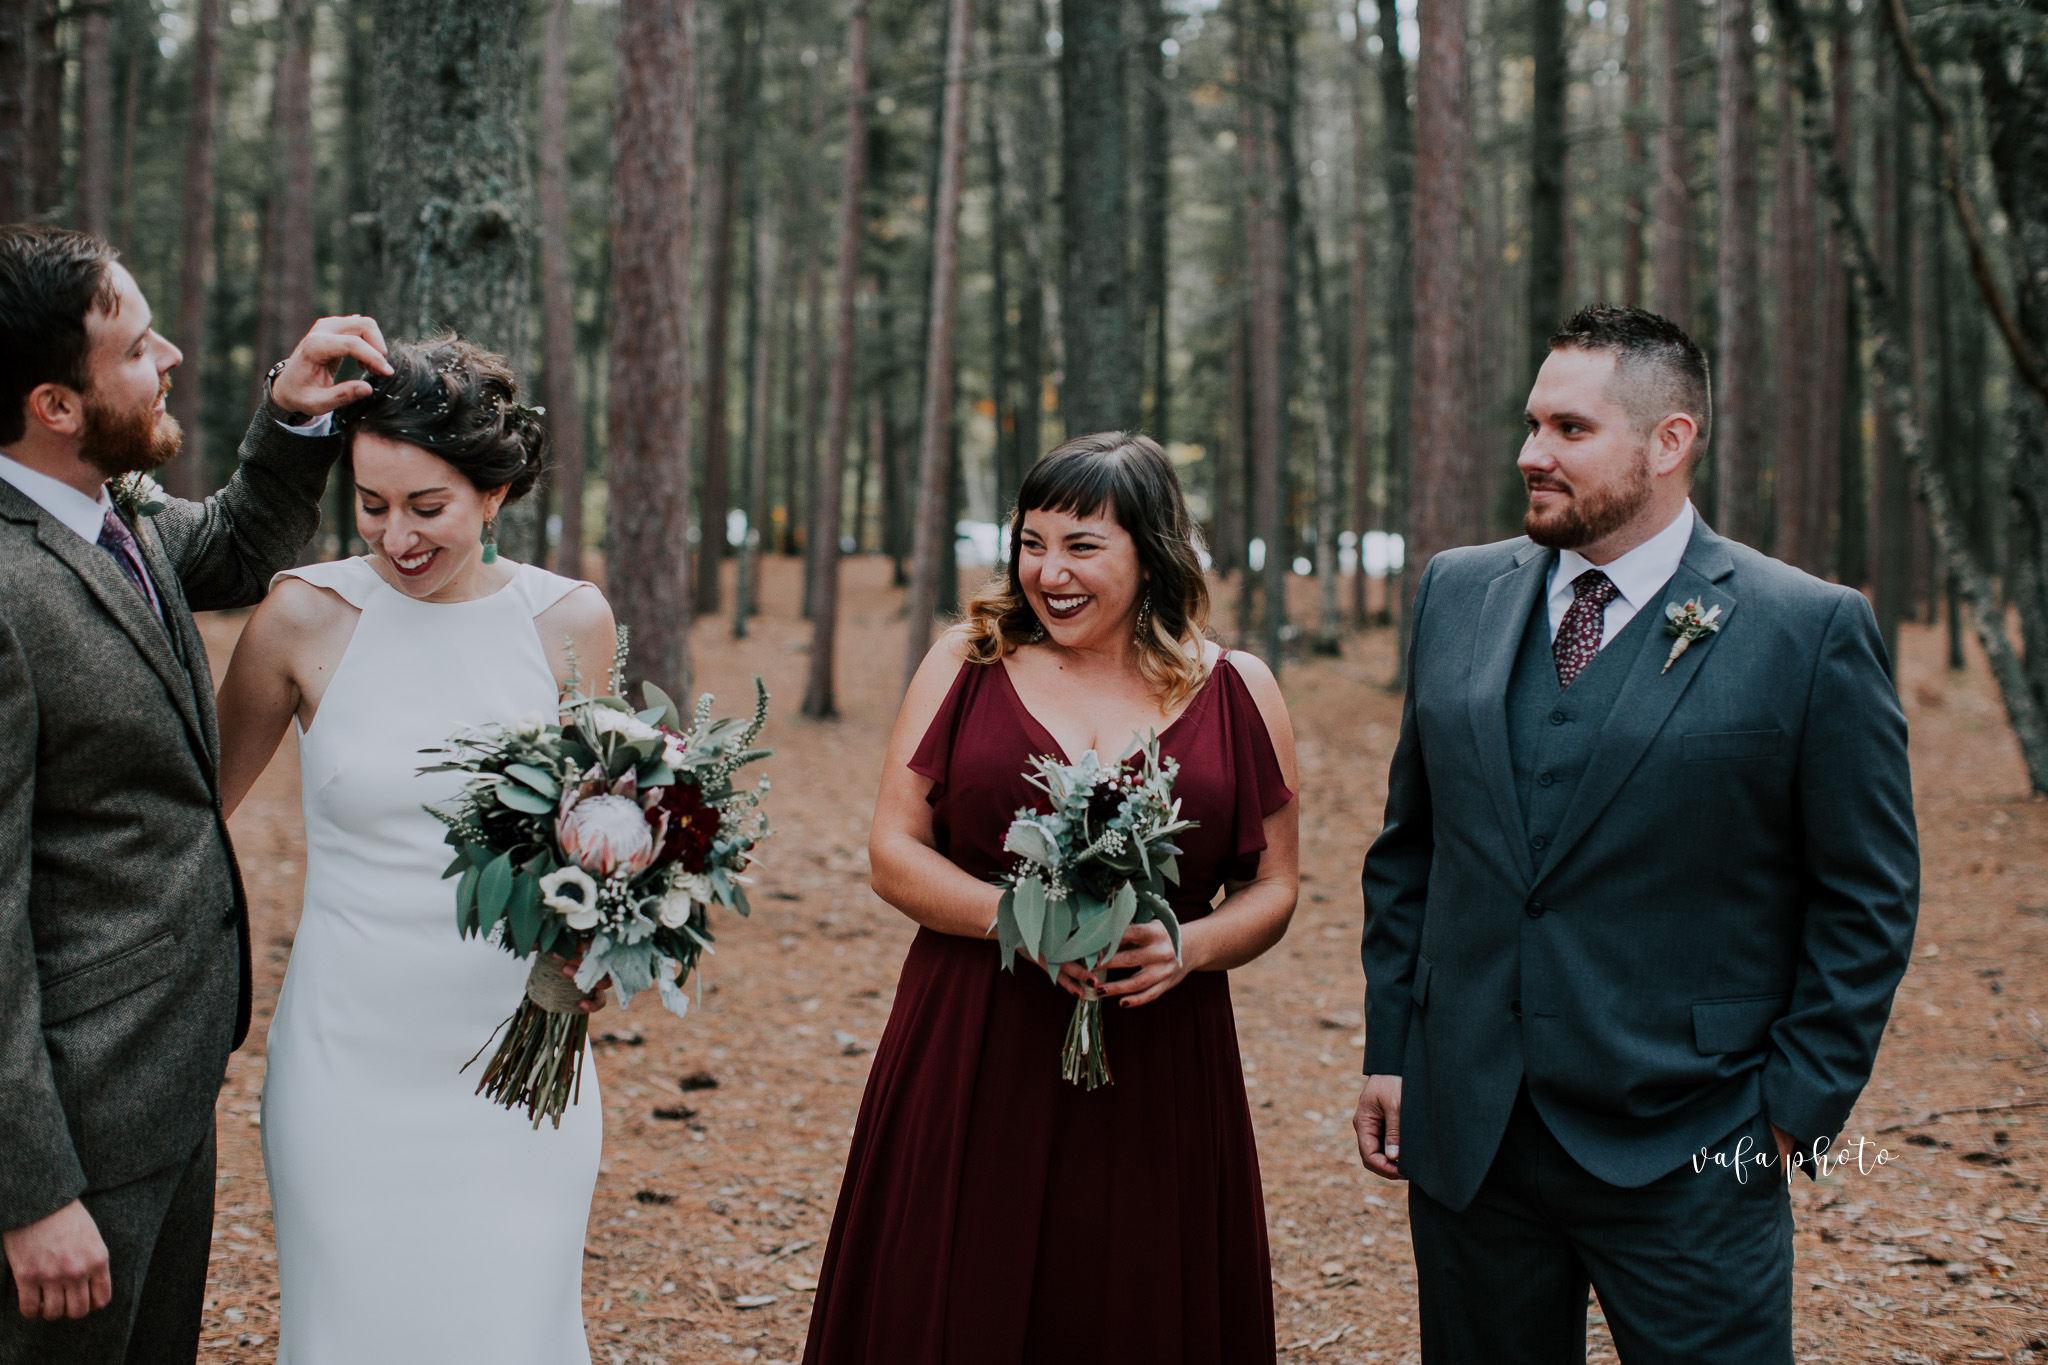 Little-Presque-Isle-Michigan-Wedding-Kim-Kyle-Vafa-Photo-287.jpg